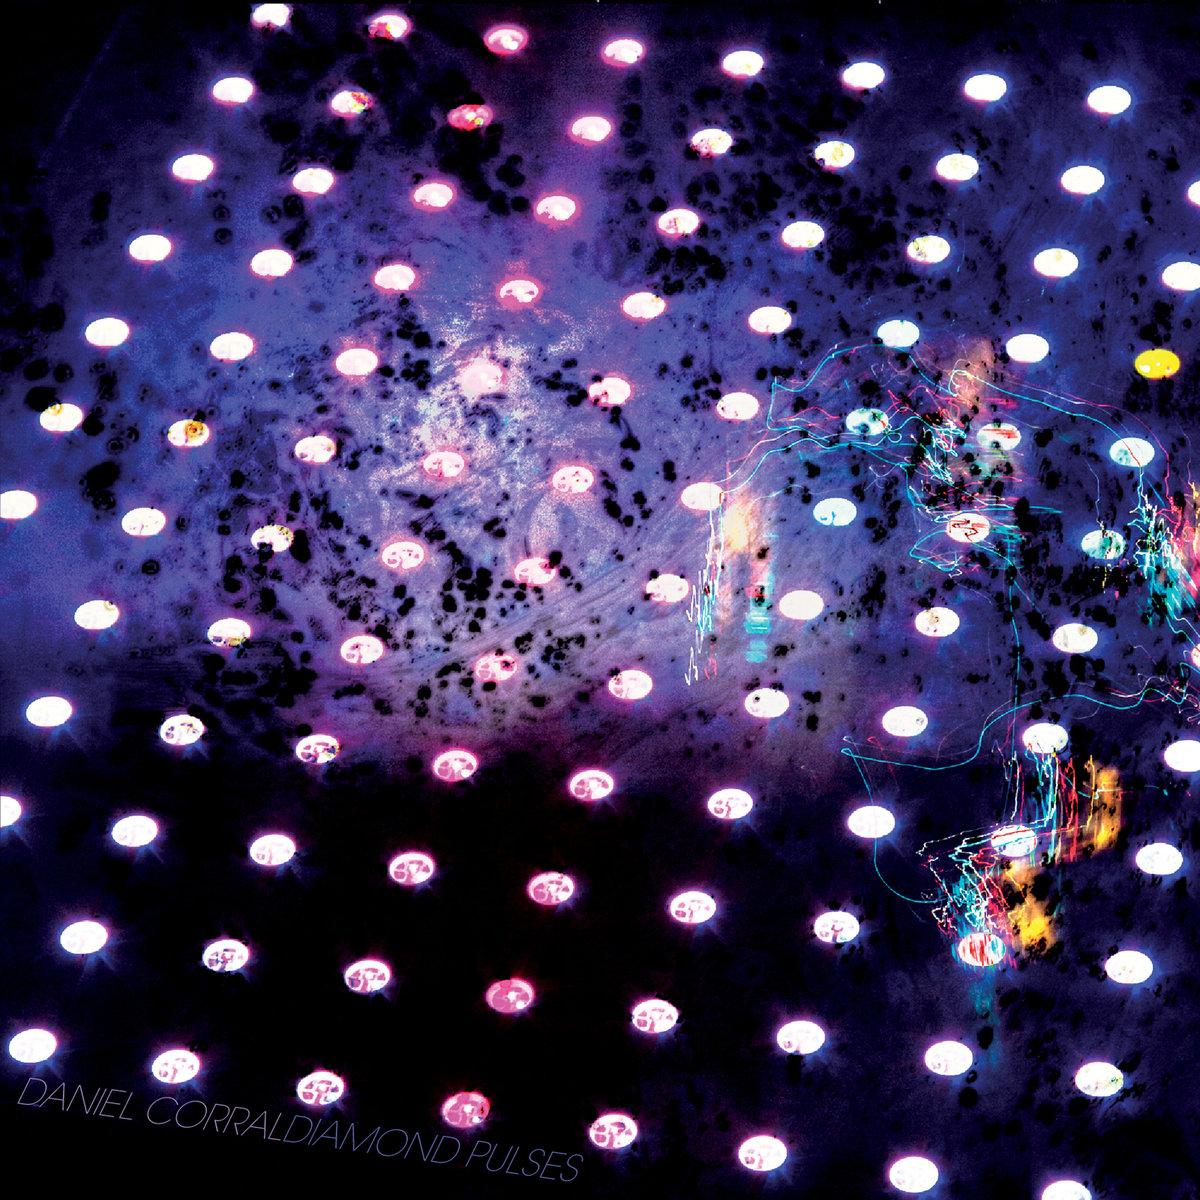 Daniel Corral | Diamond Pulses